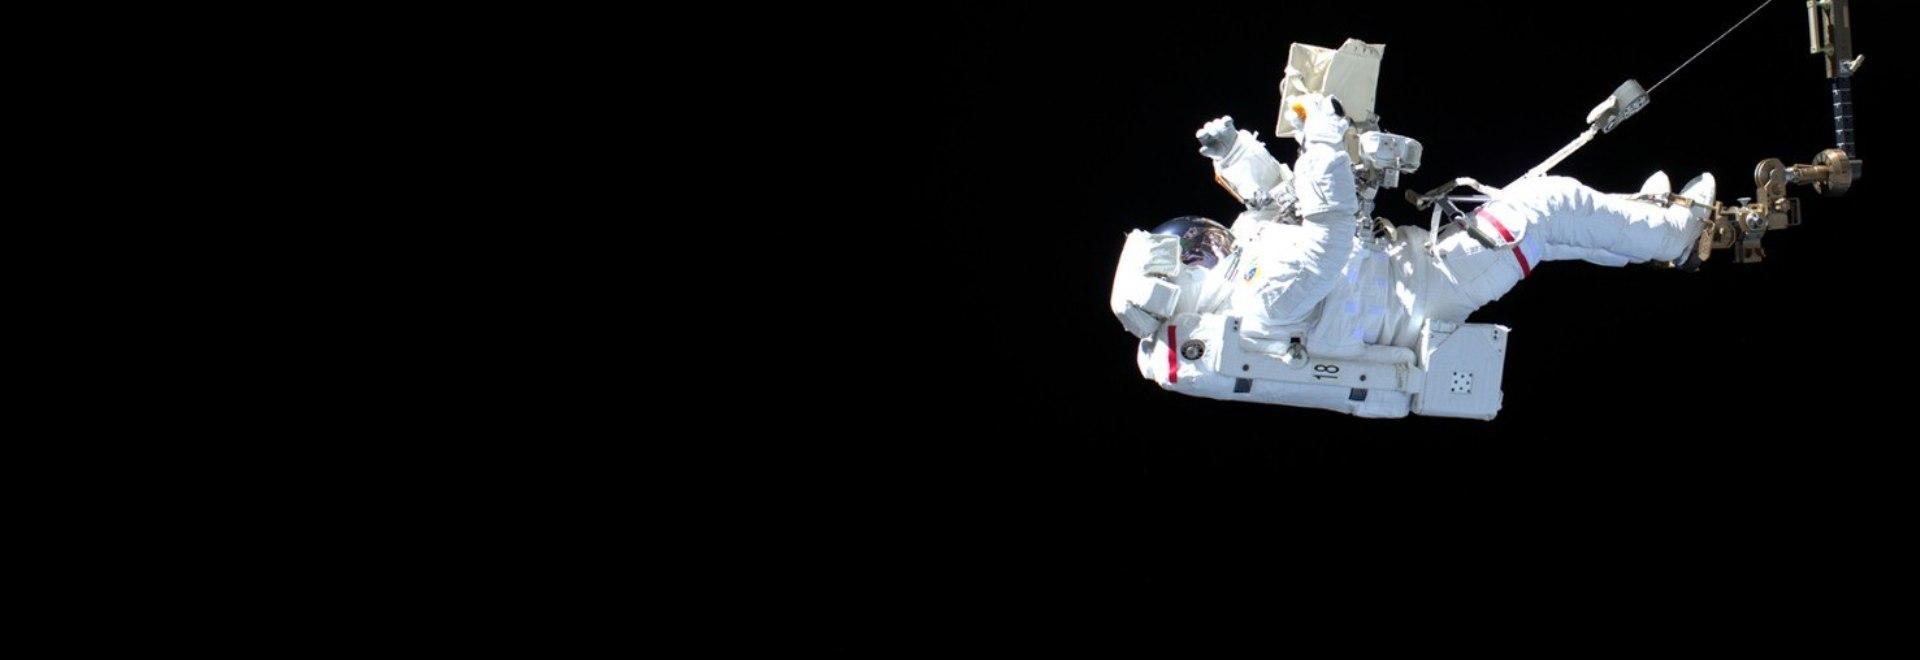 Space Beyond